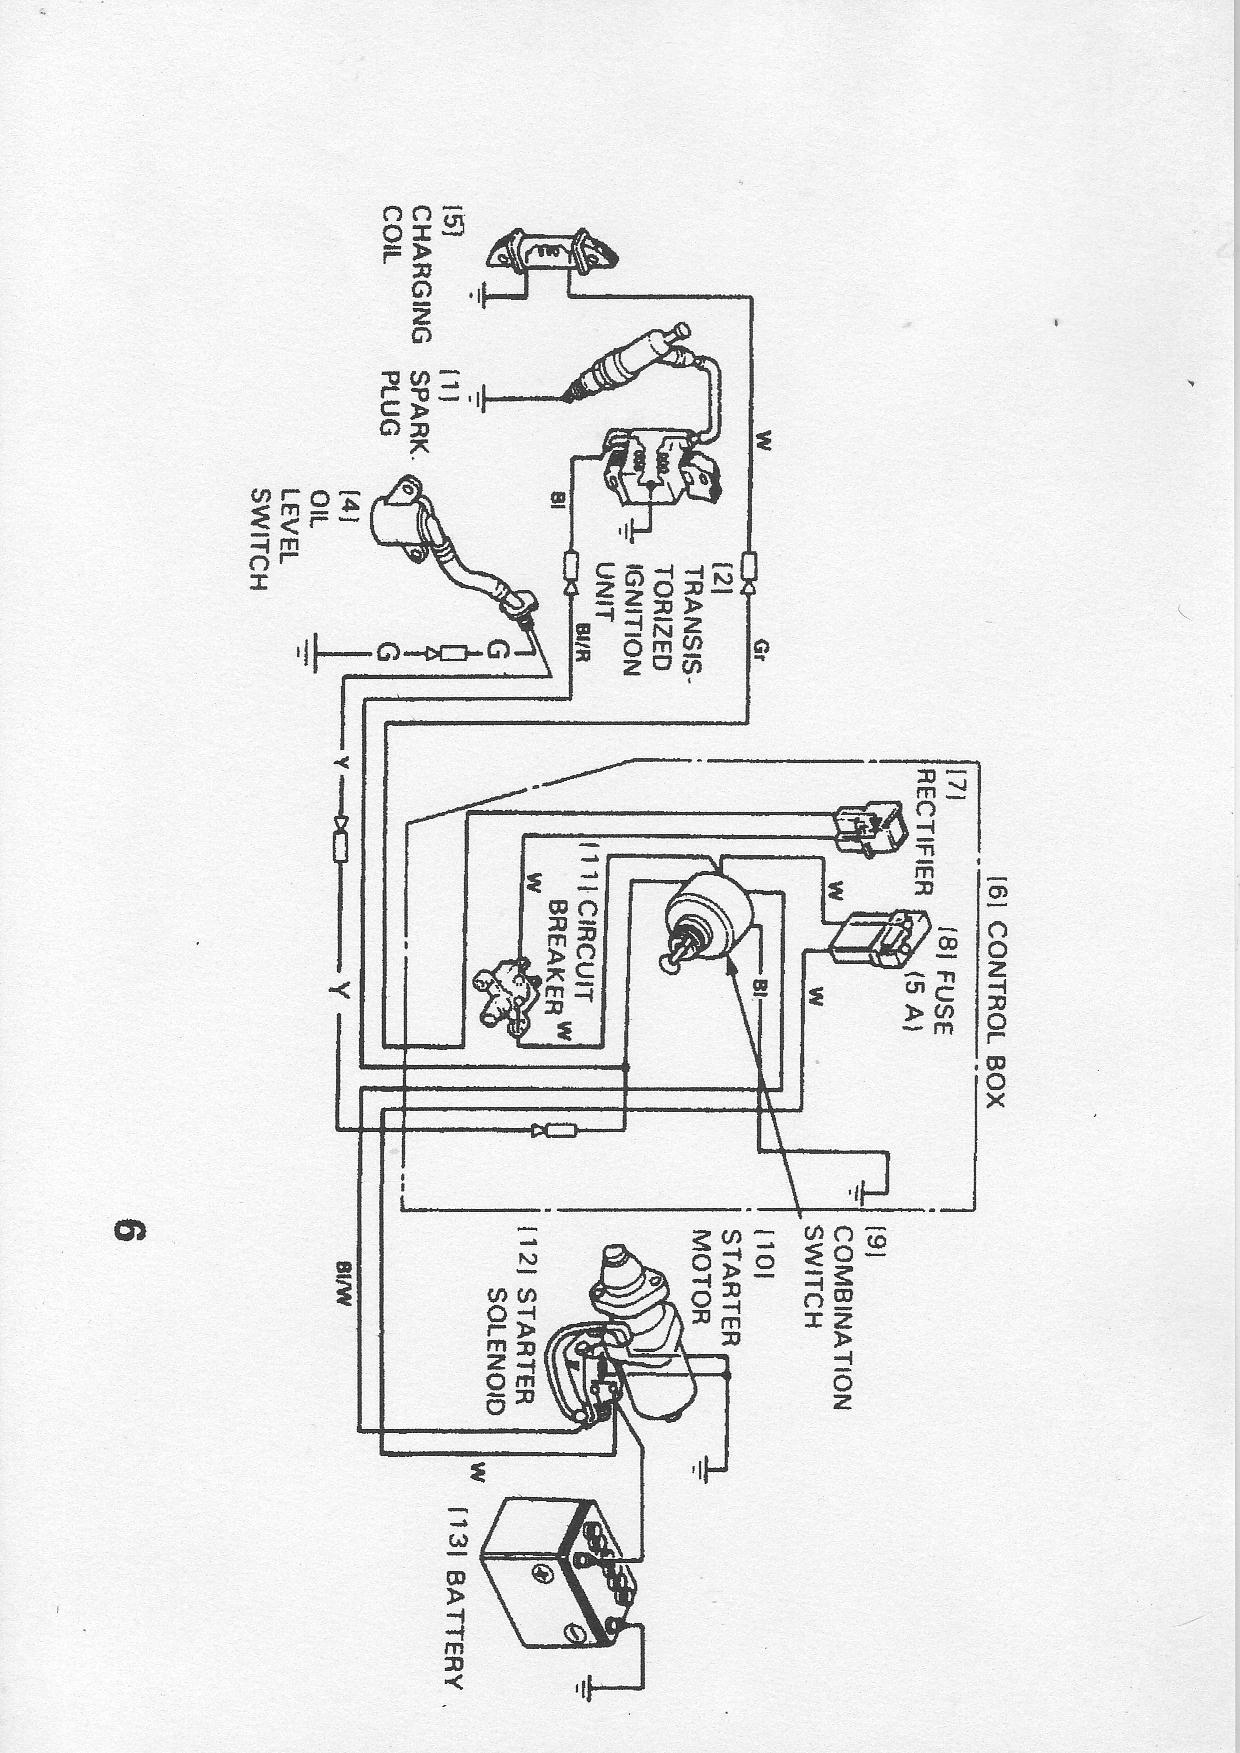 Ebook-6760] Honda Gx390 Parts Manual Schematics   2019 Ebook Library - Honda Gx390 Electric Start Wiring Diagram